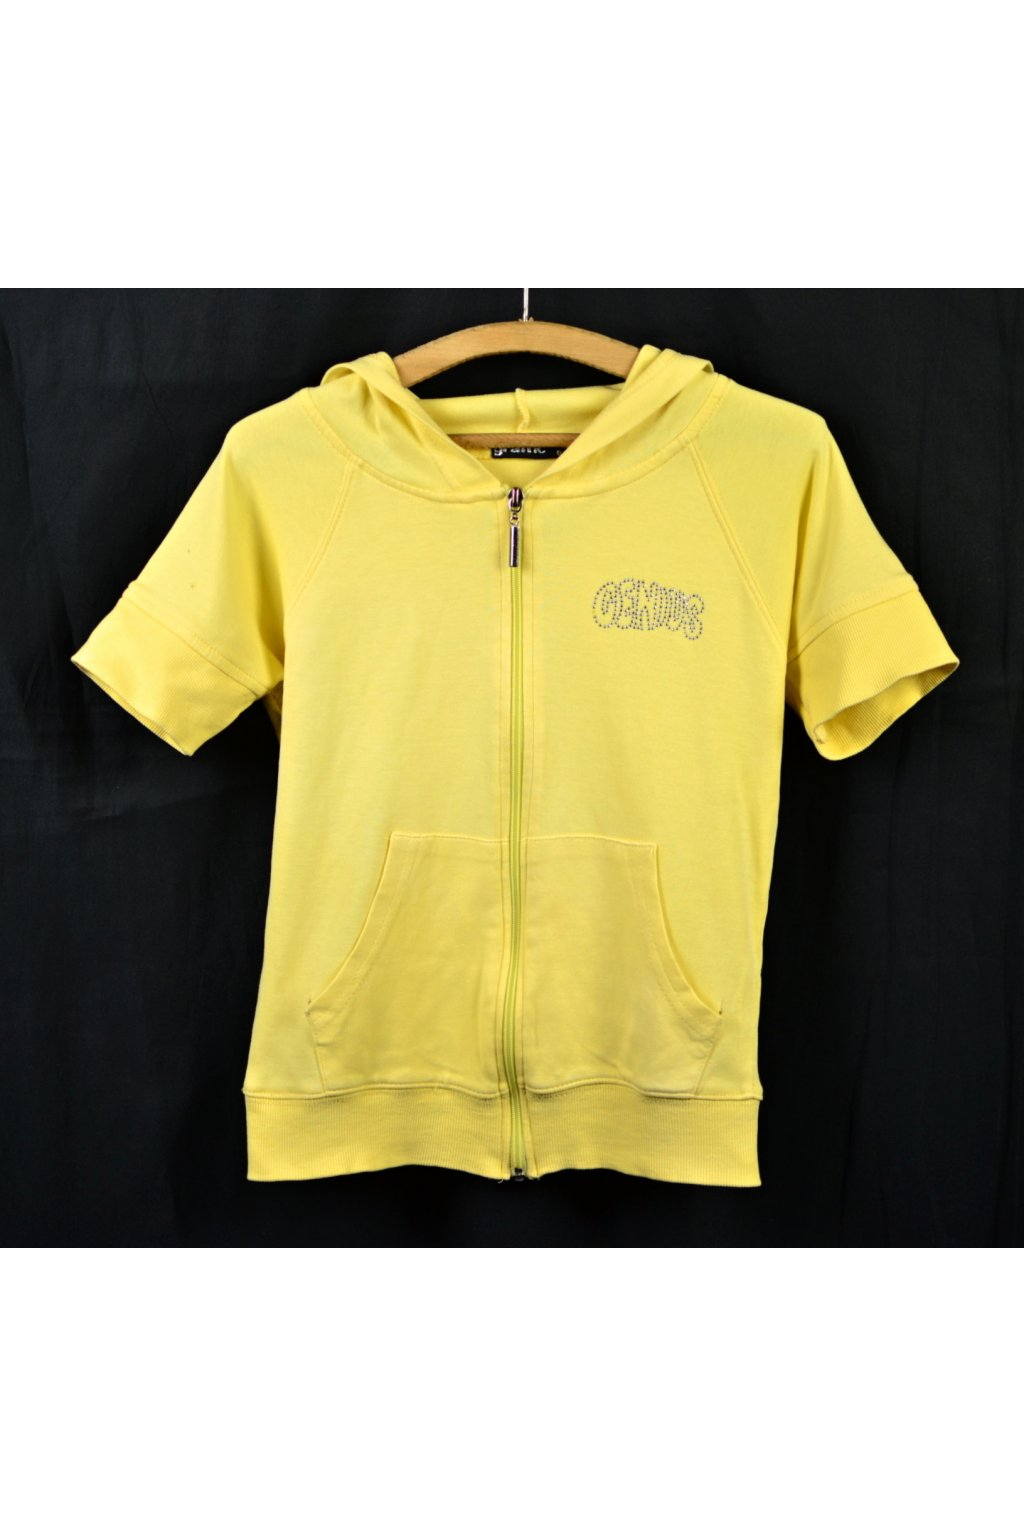 Mikina bez rukávů Graffic vel 128/134 žlutá